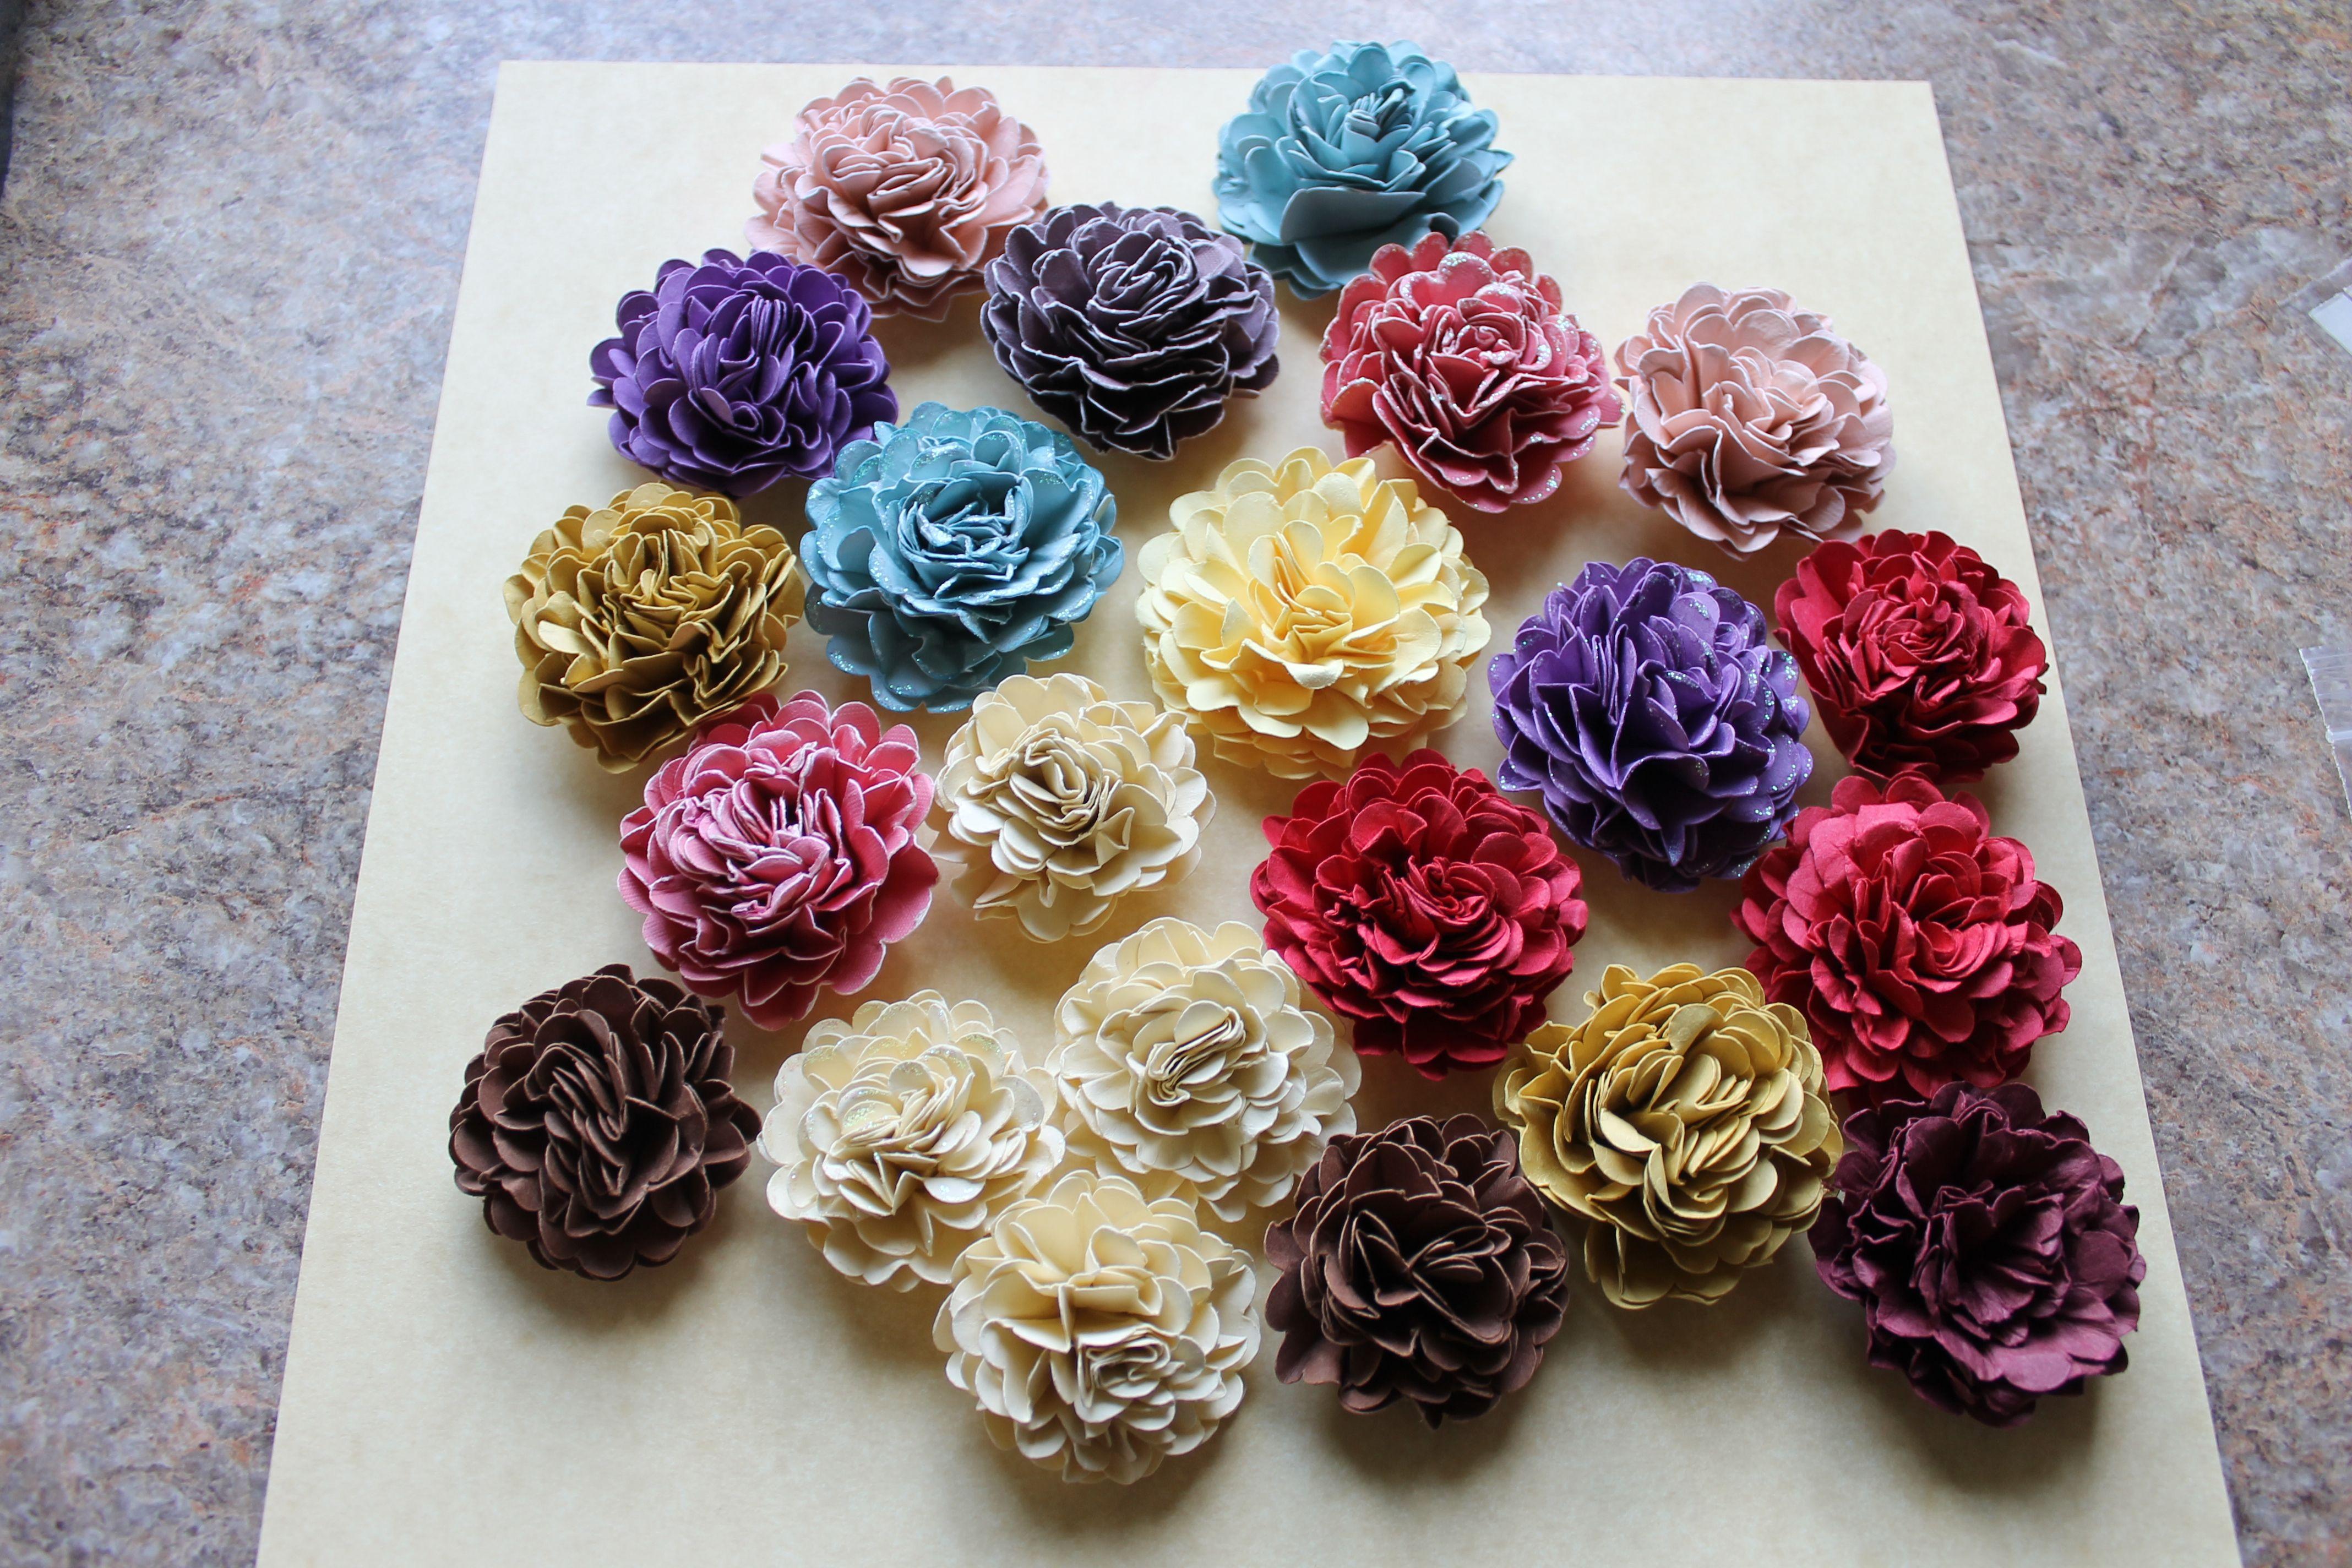 Handmade Paper Carnations For Floral Arranging Scrapbooking Card